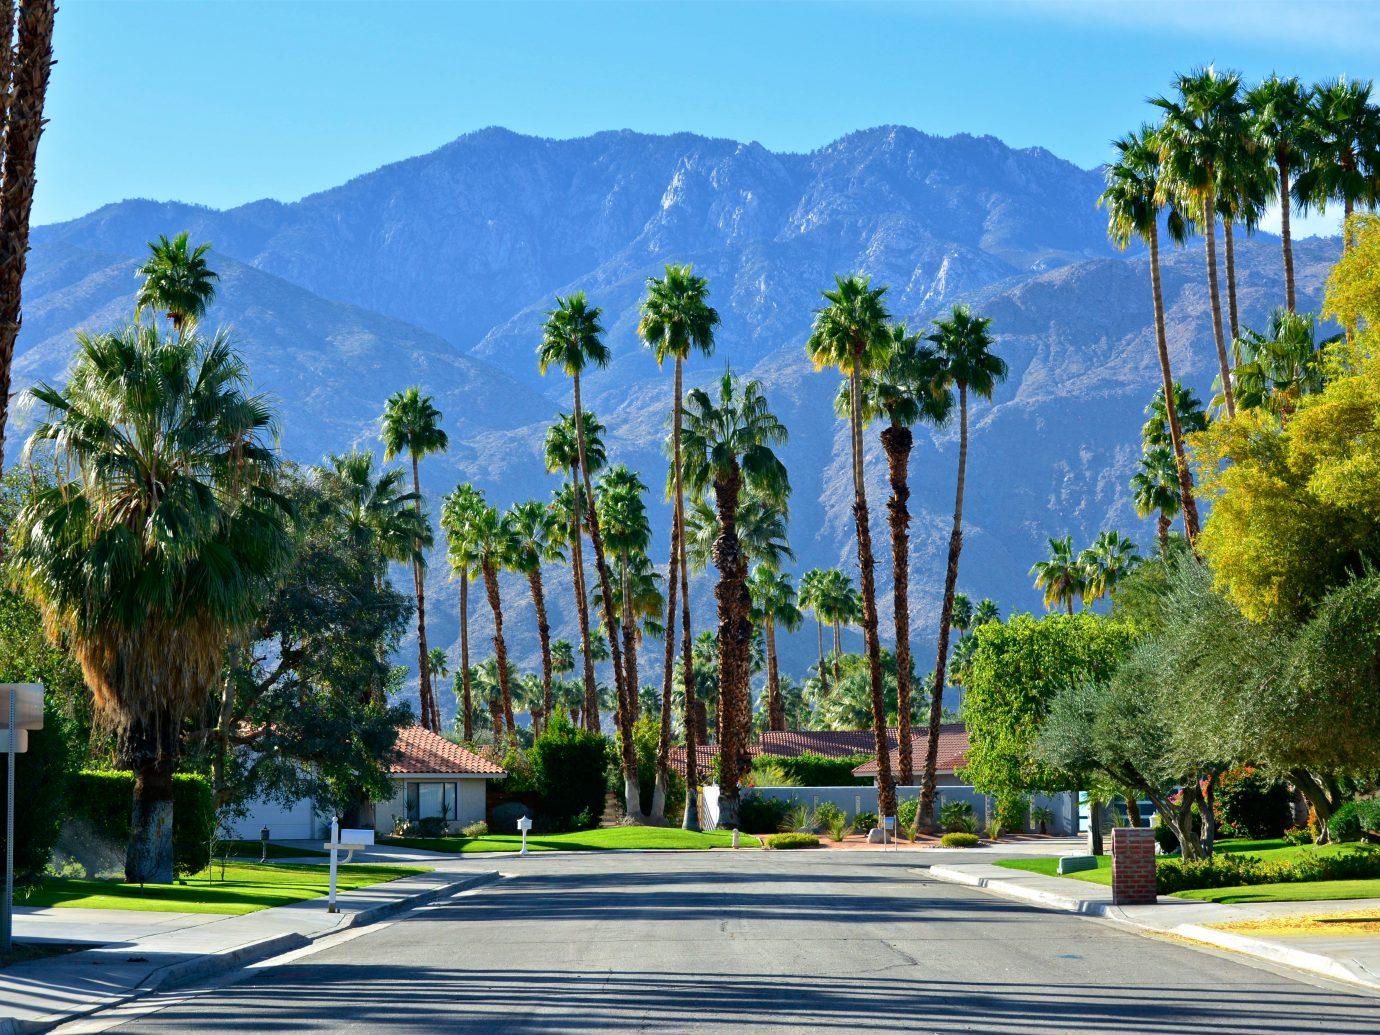 A street scene in Palm Springs